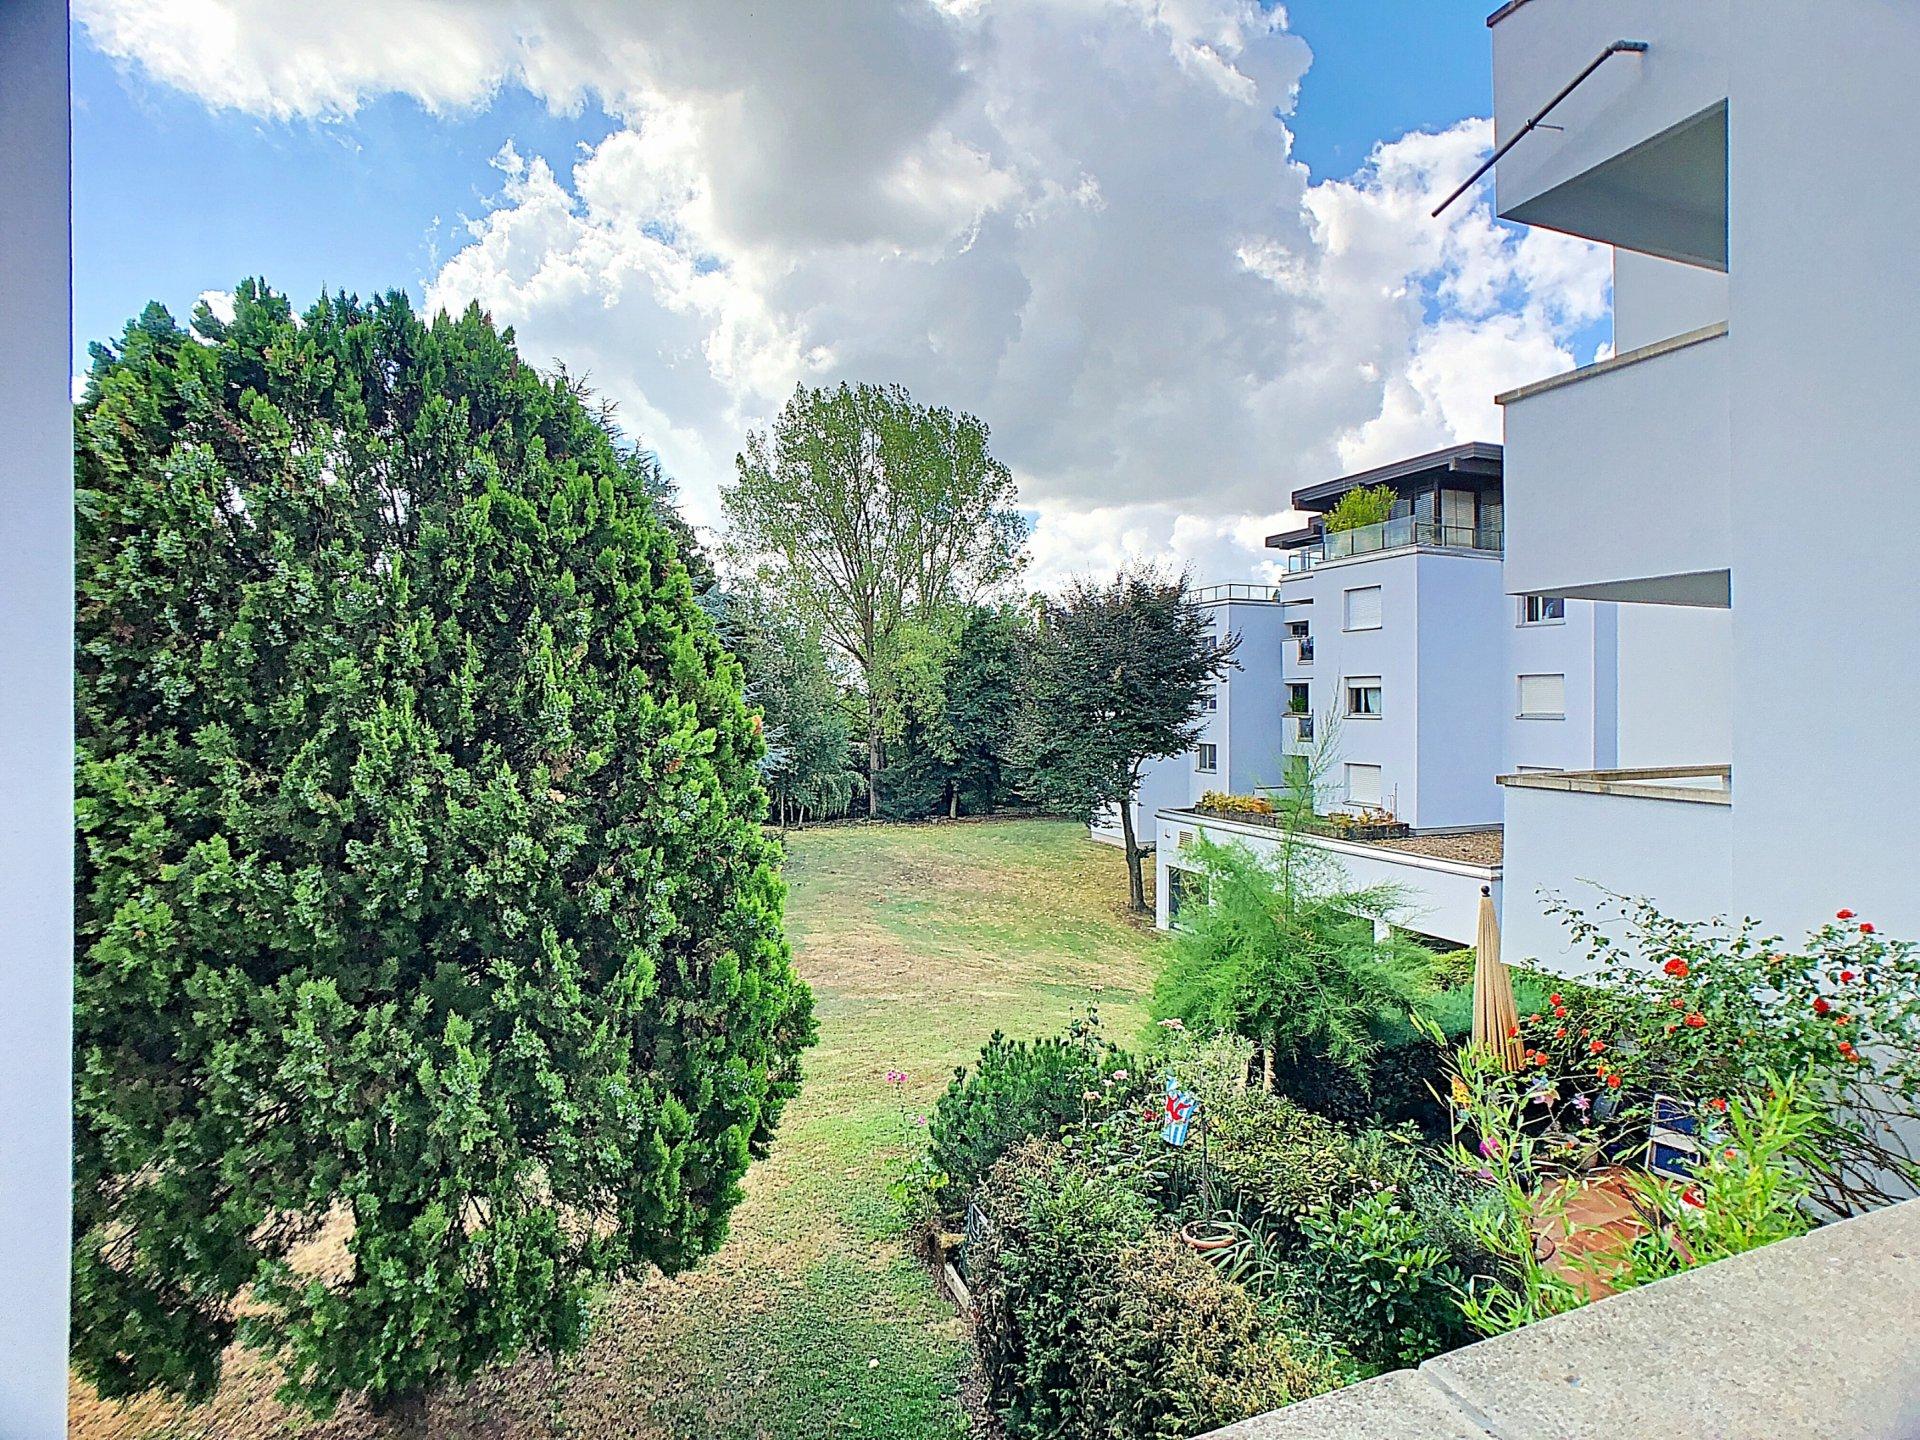 2 bedroom apartment for sale in Strassen